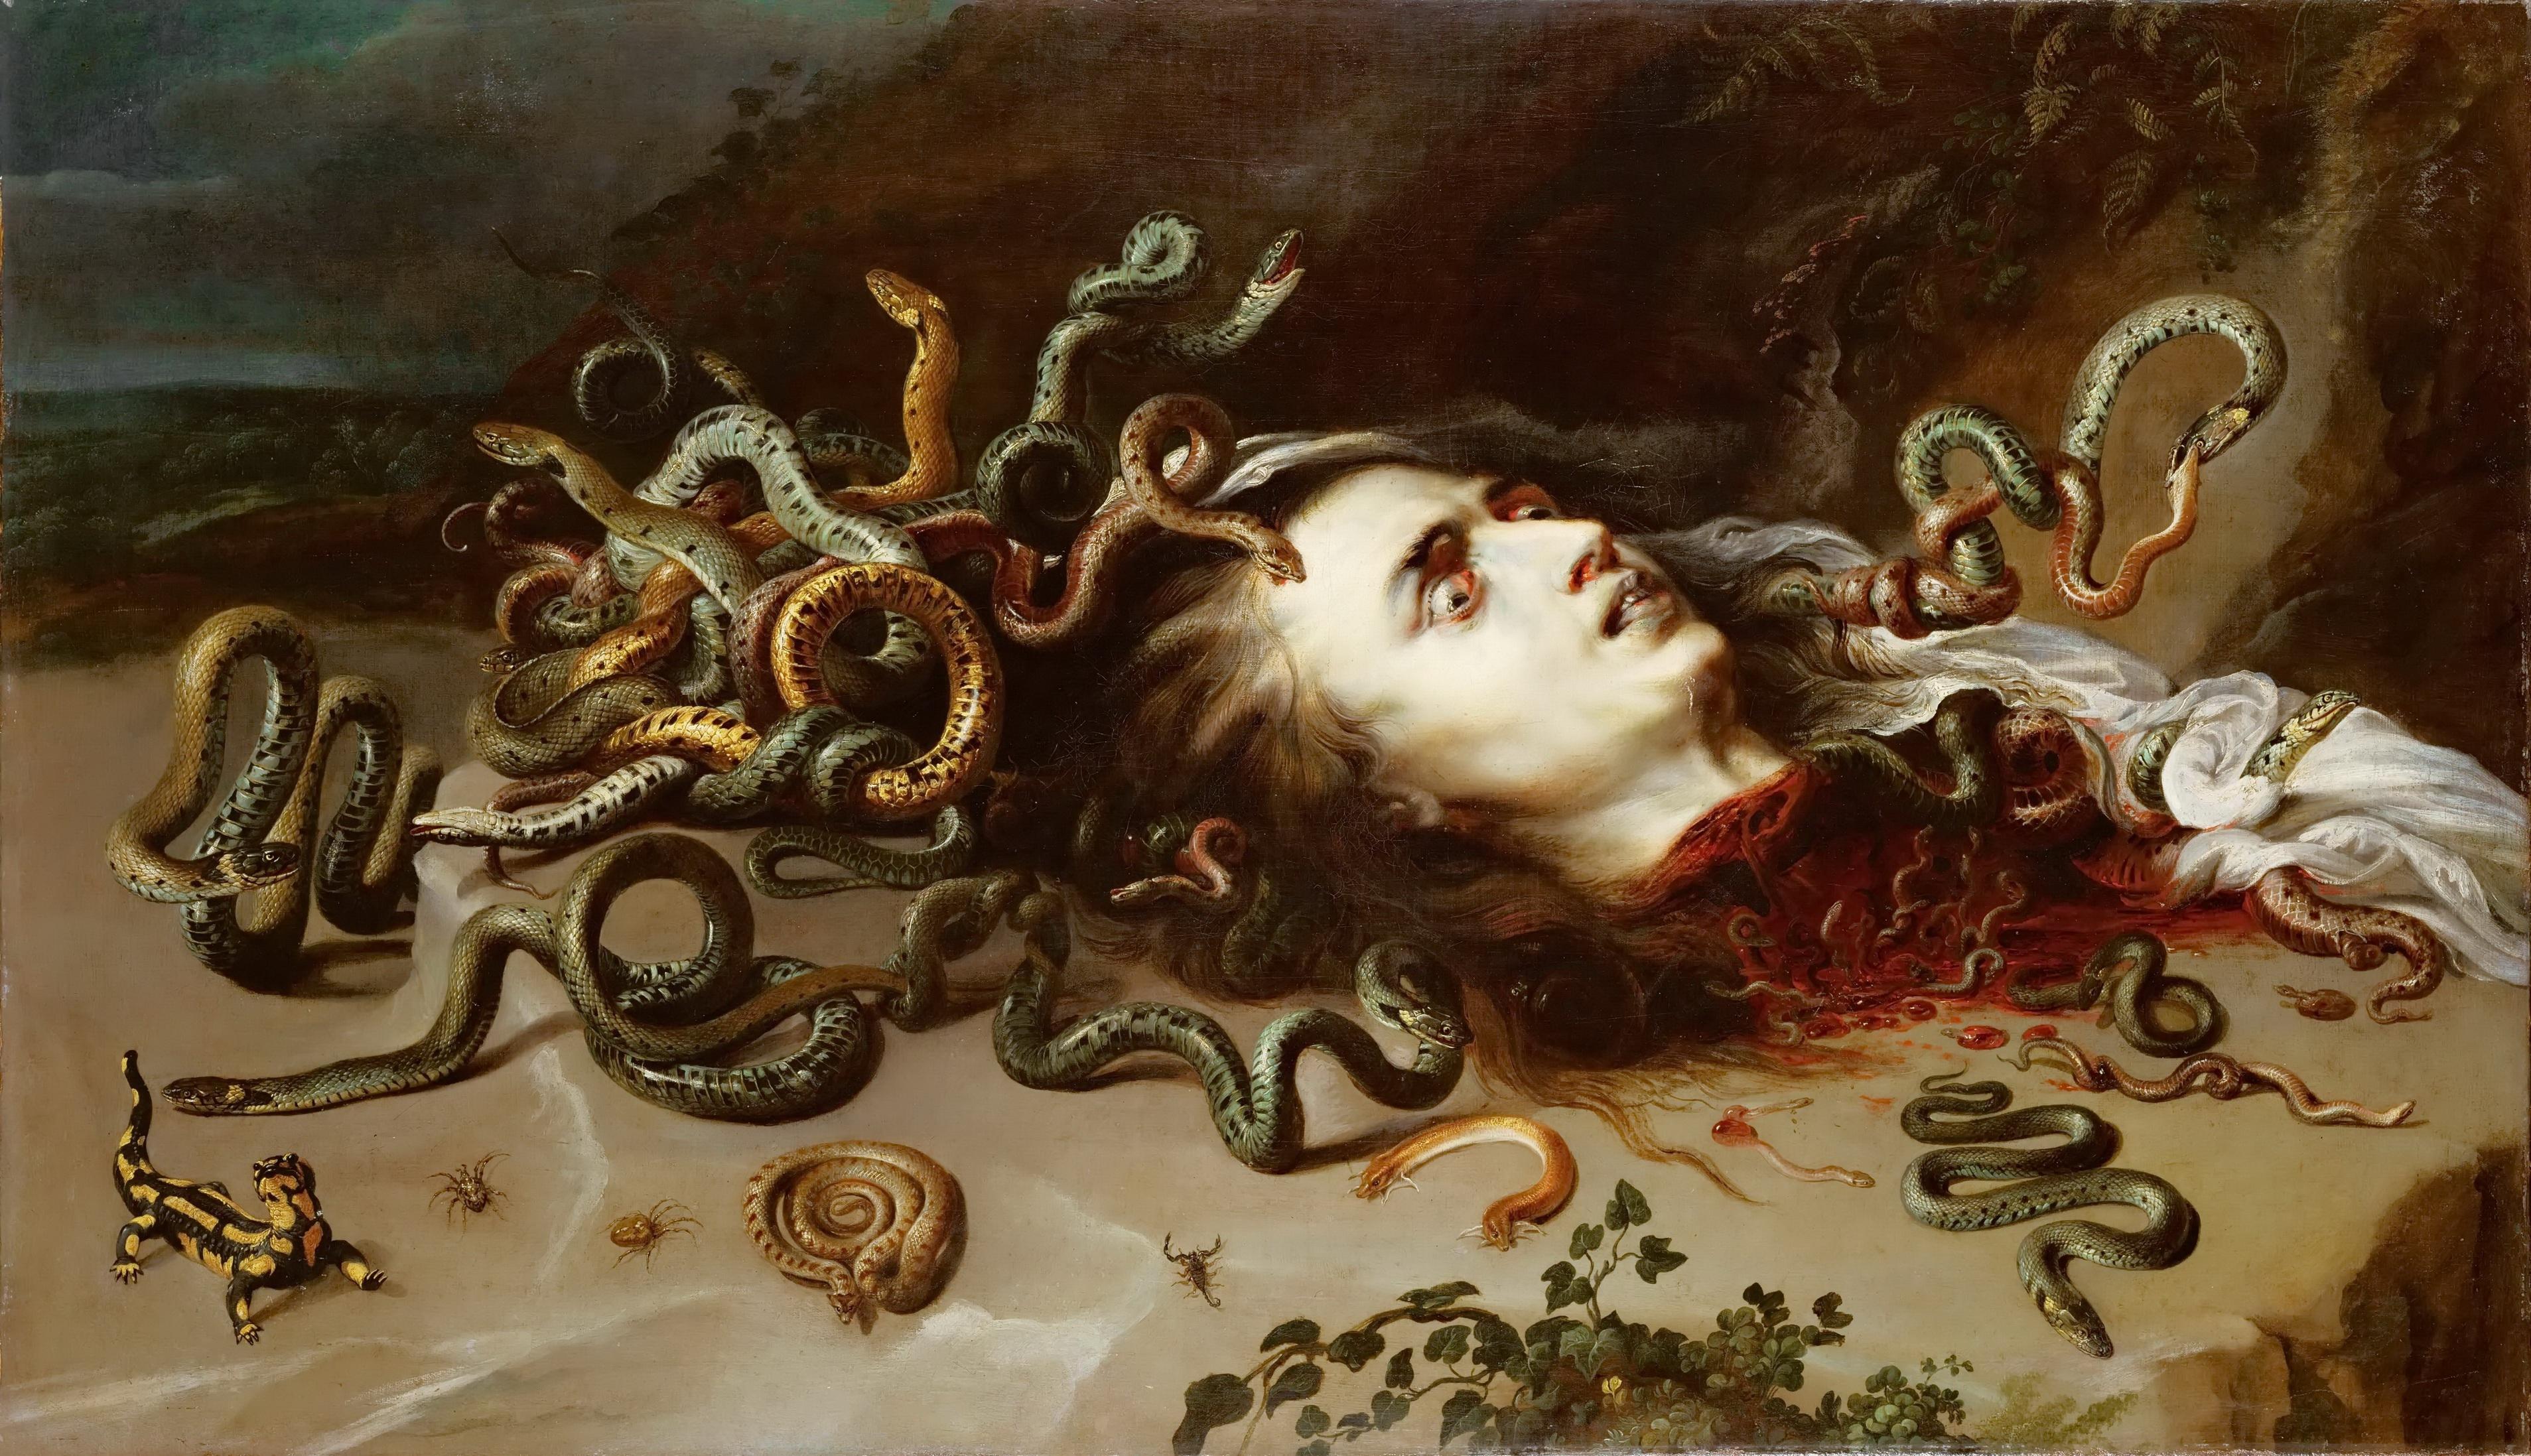 File:Rubens Medusa.jpeg